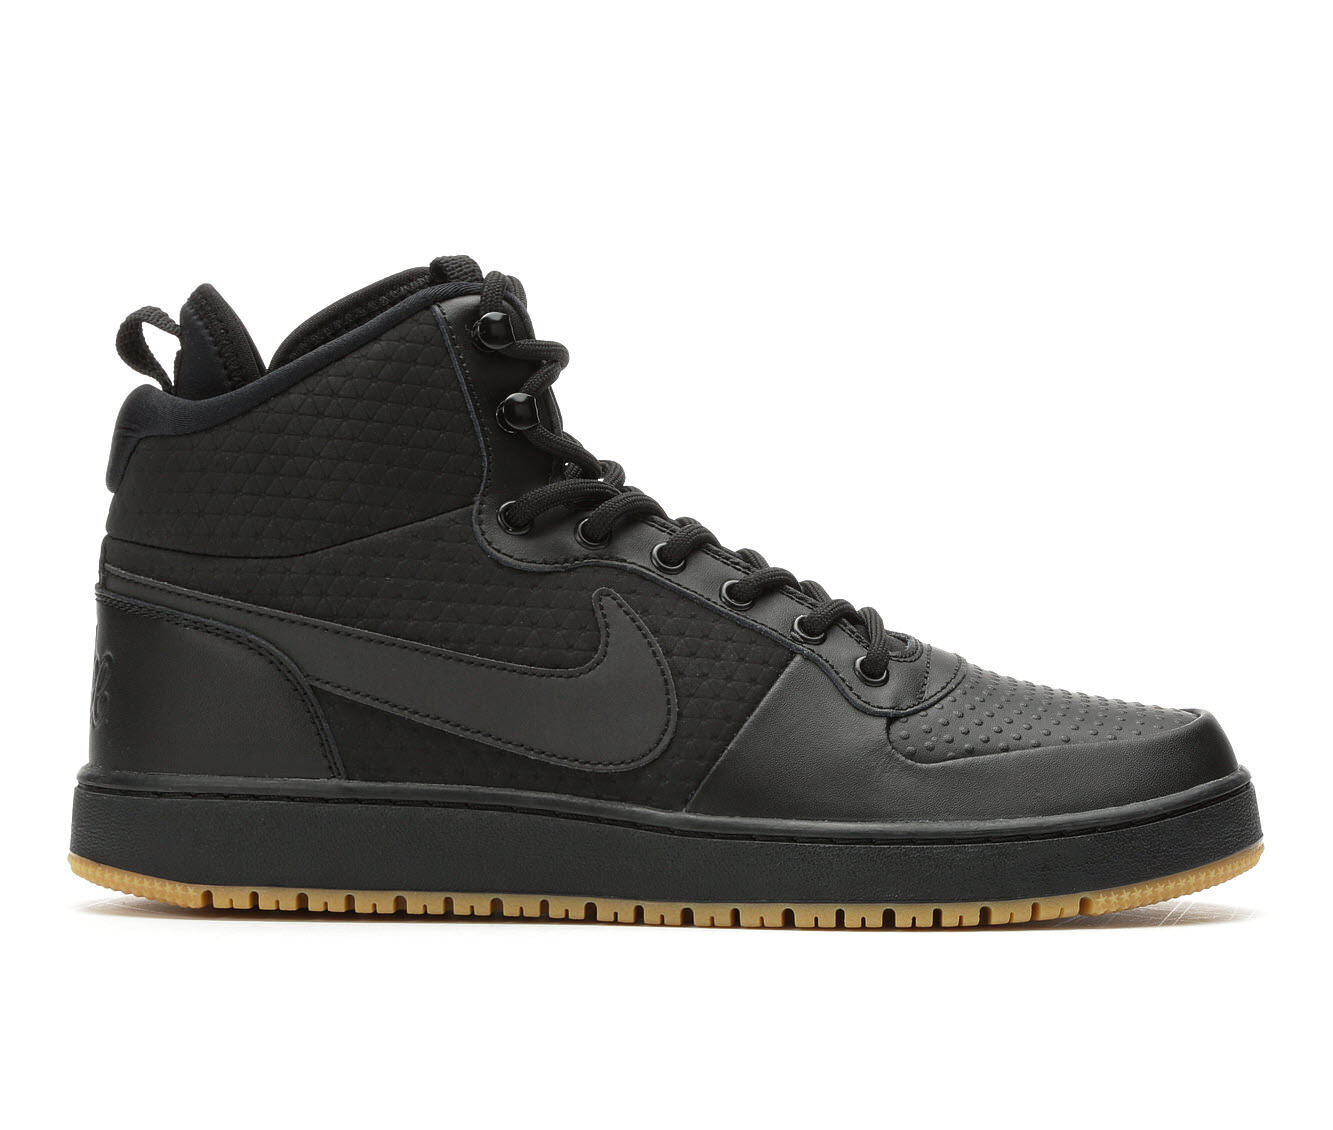 Men's Nike Ebernon Mid SE Sneakers Blk/Blk/Gum